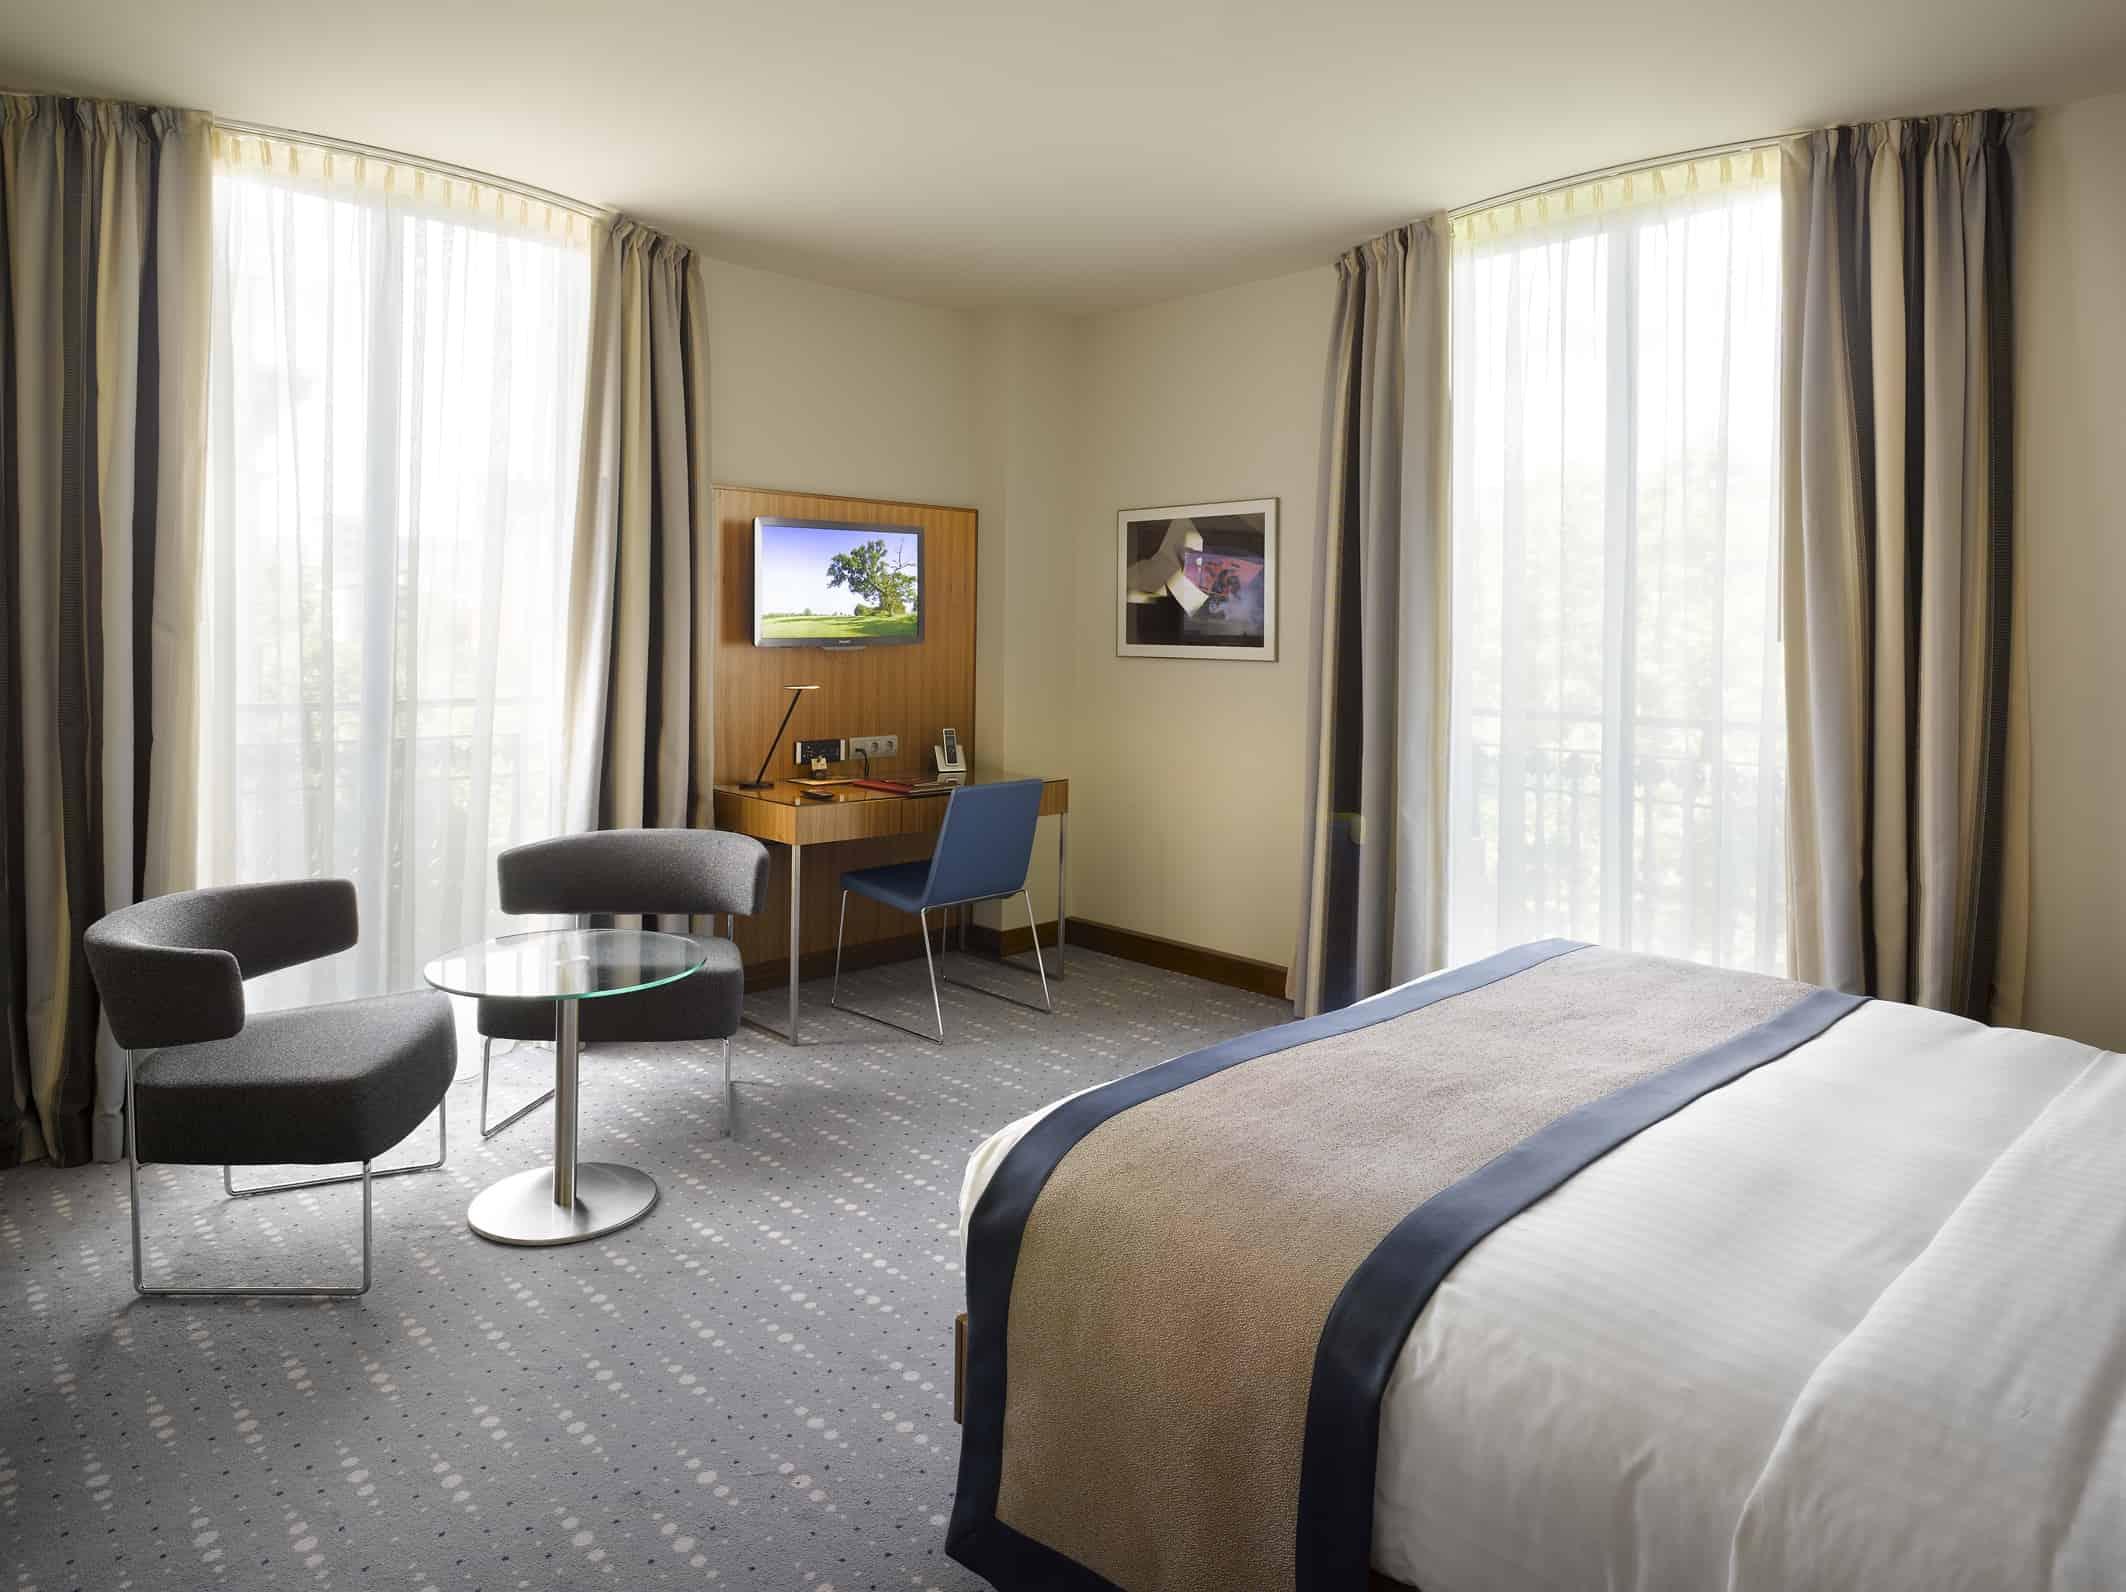 K+K Hotel Picasso Guestroom (executive)